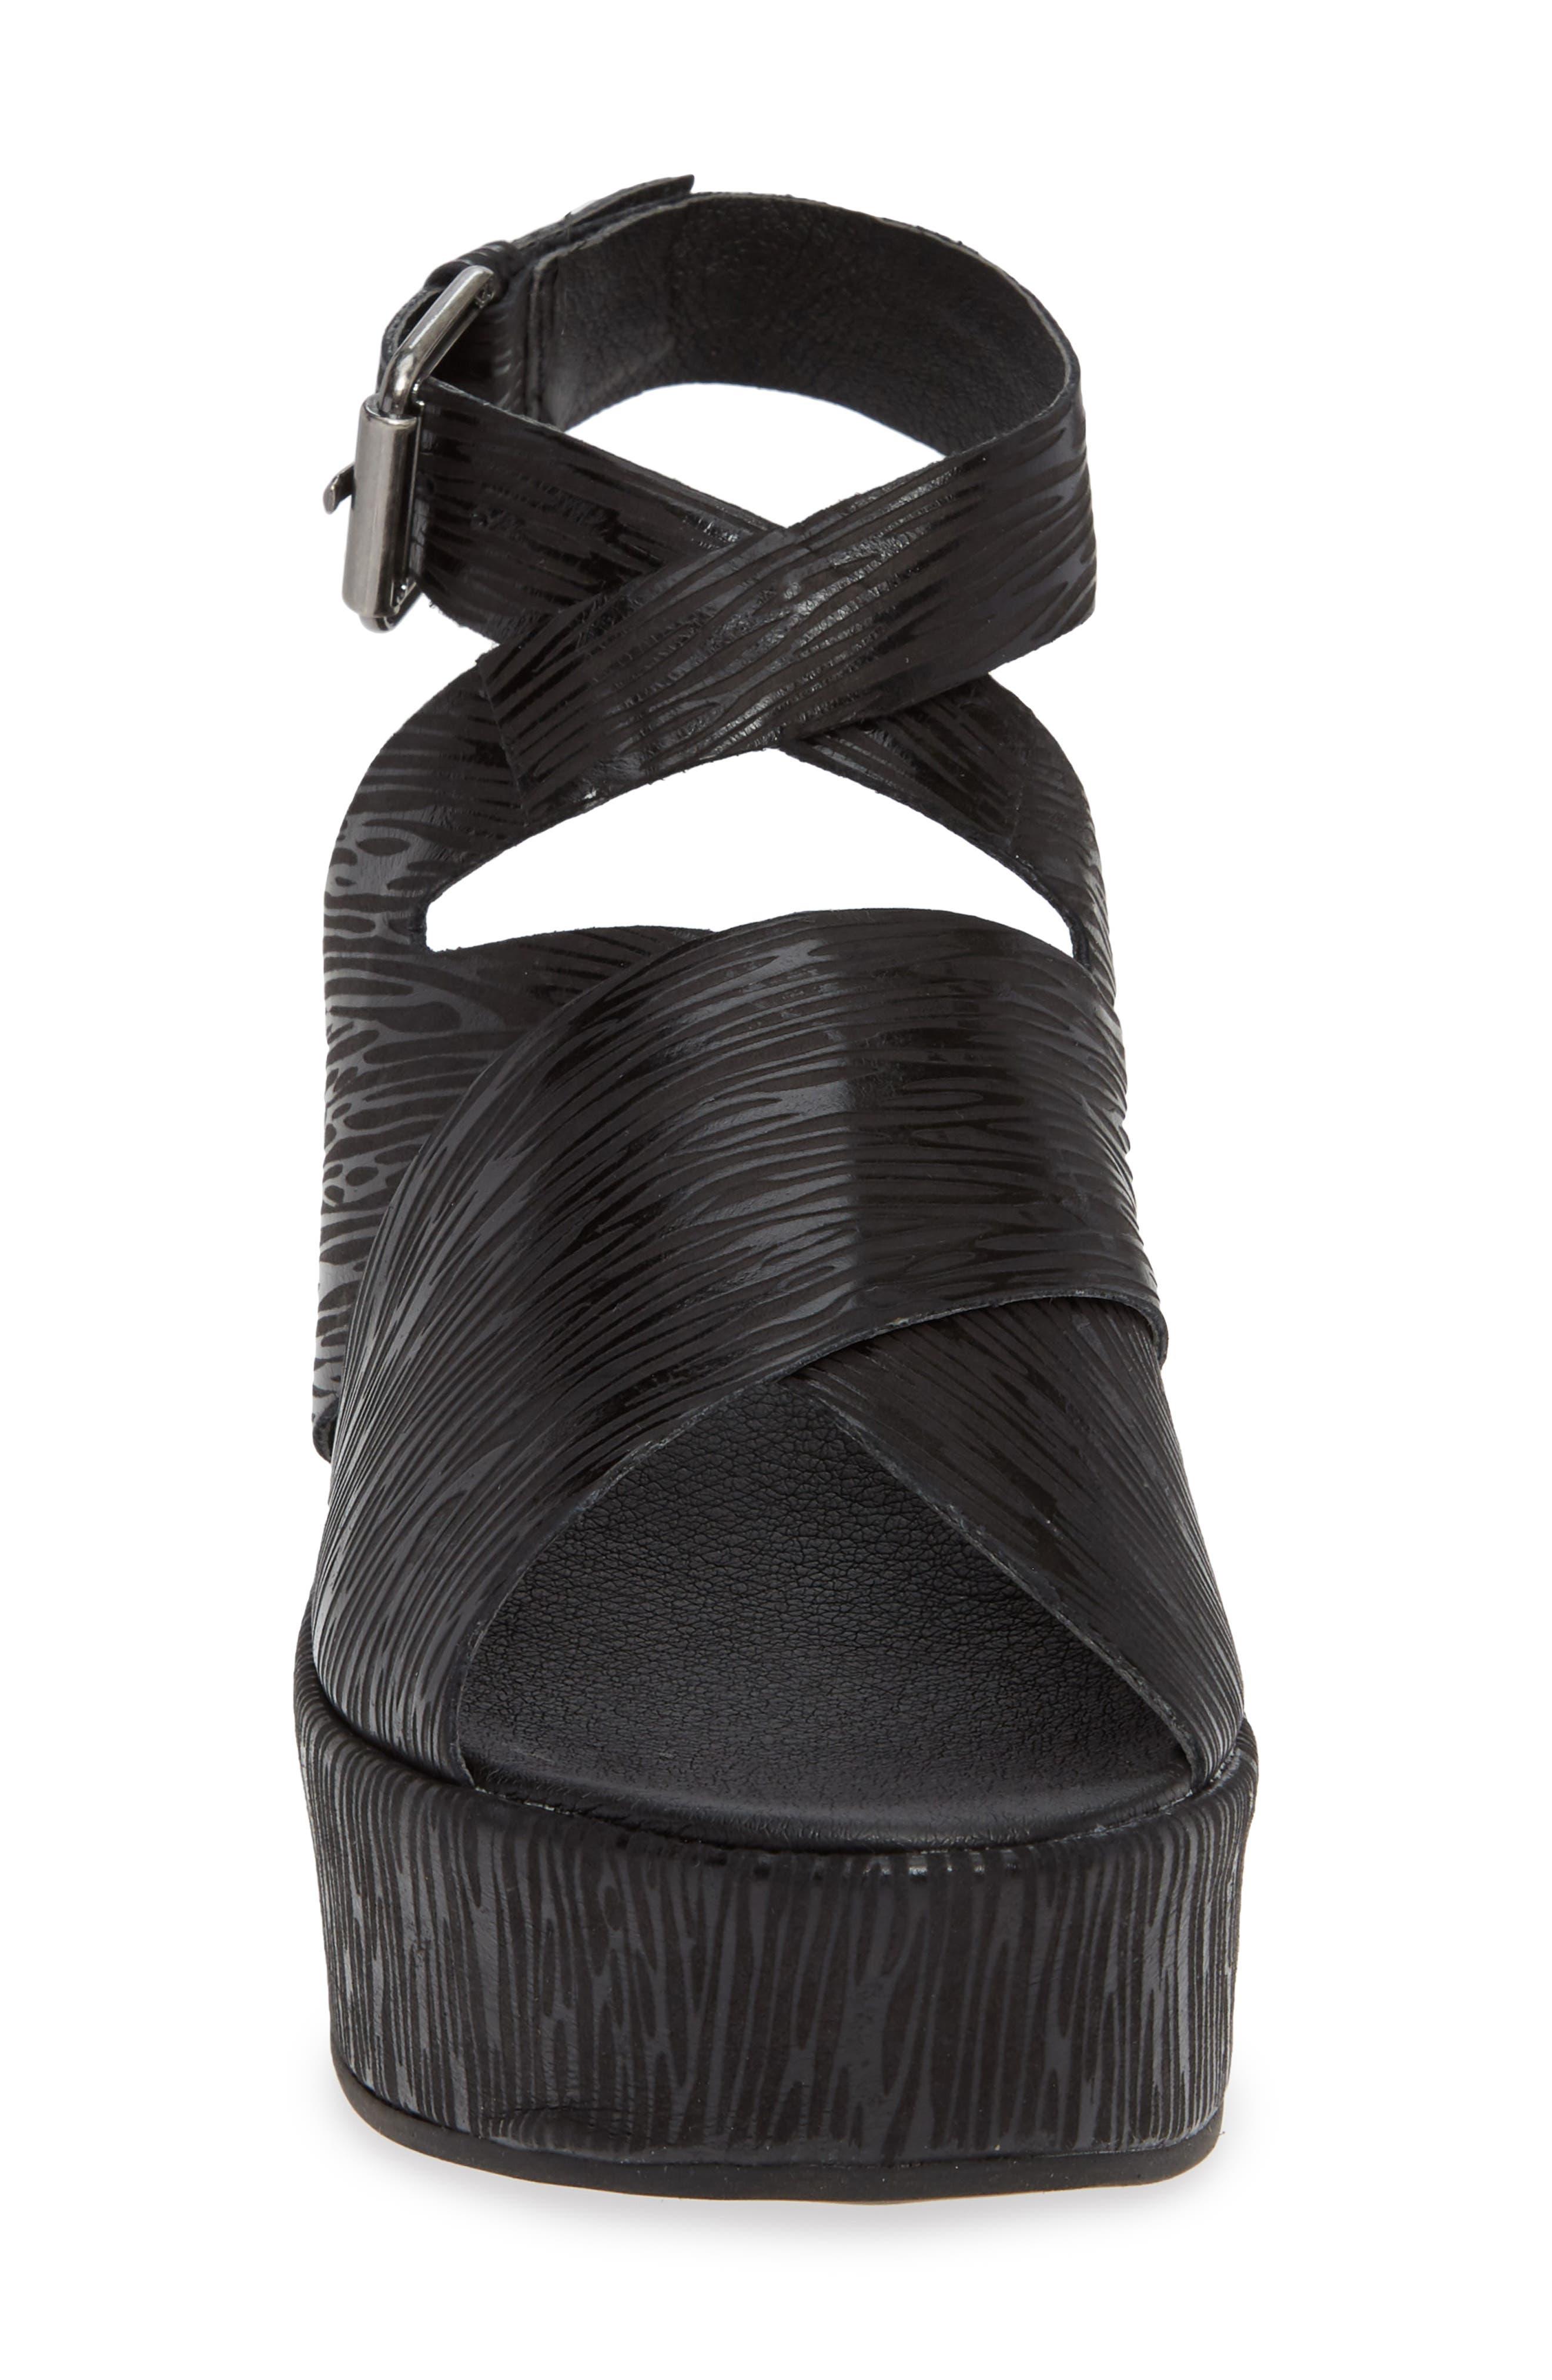 Runaway Wedge Sandal,                             Alternate thumbnail 4, color,                             BLACK LIZARD PRINT LEATHER